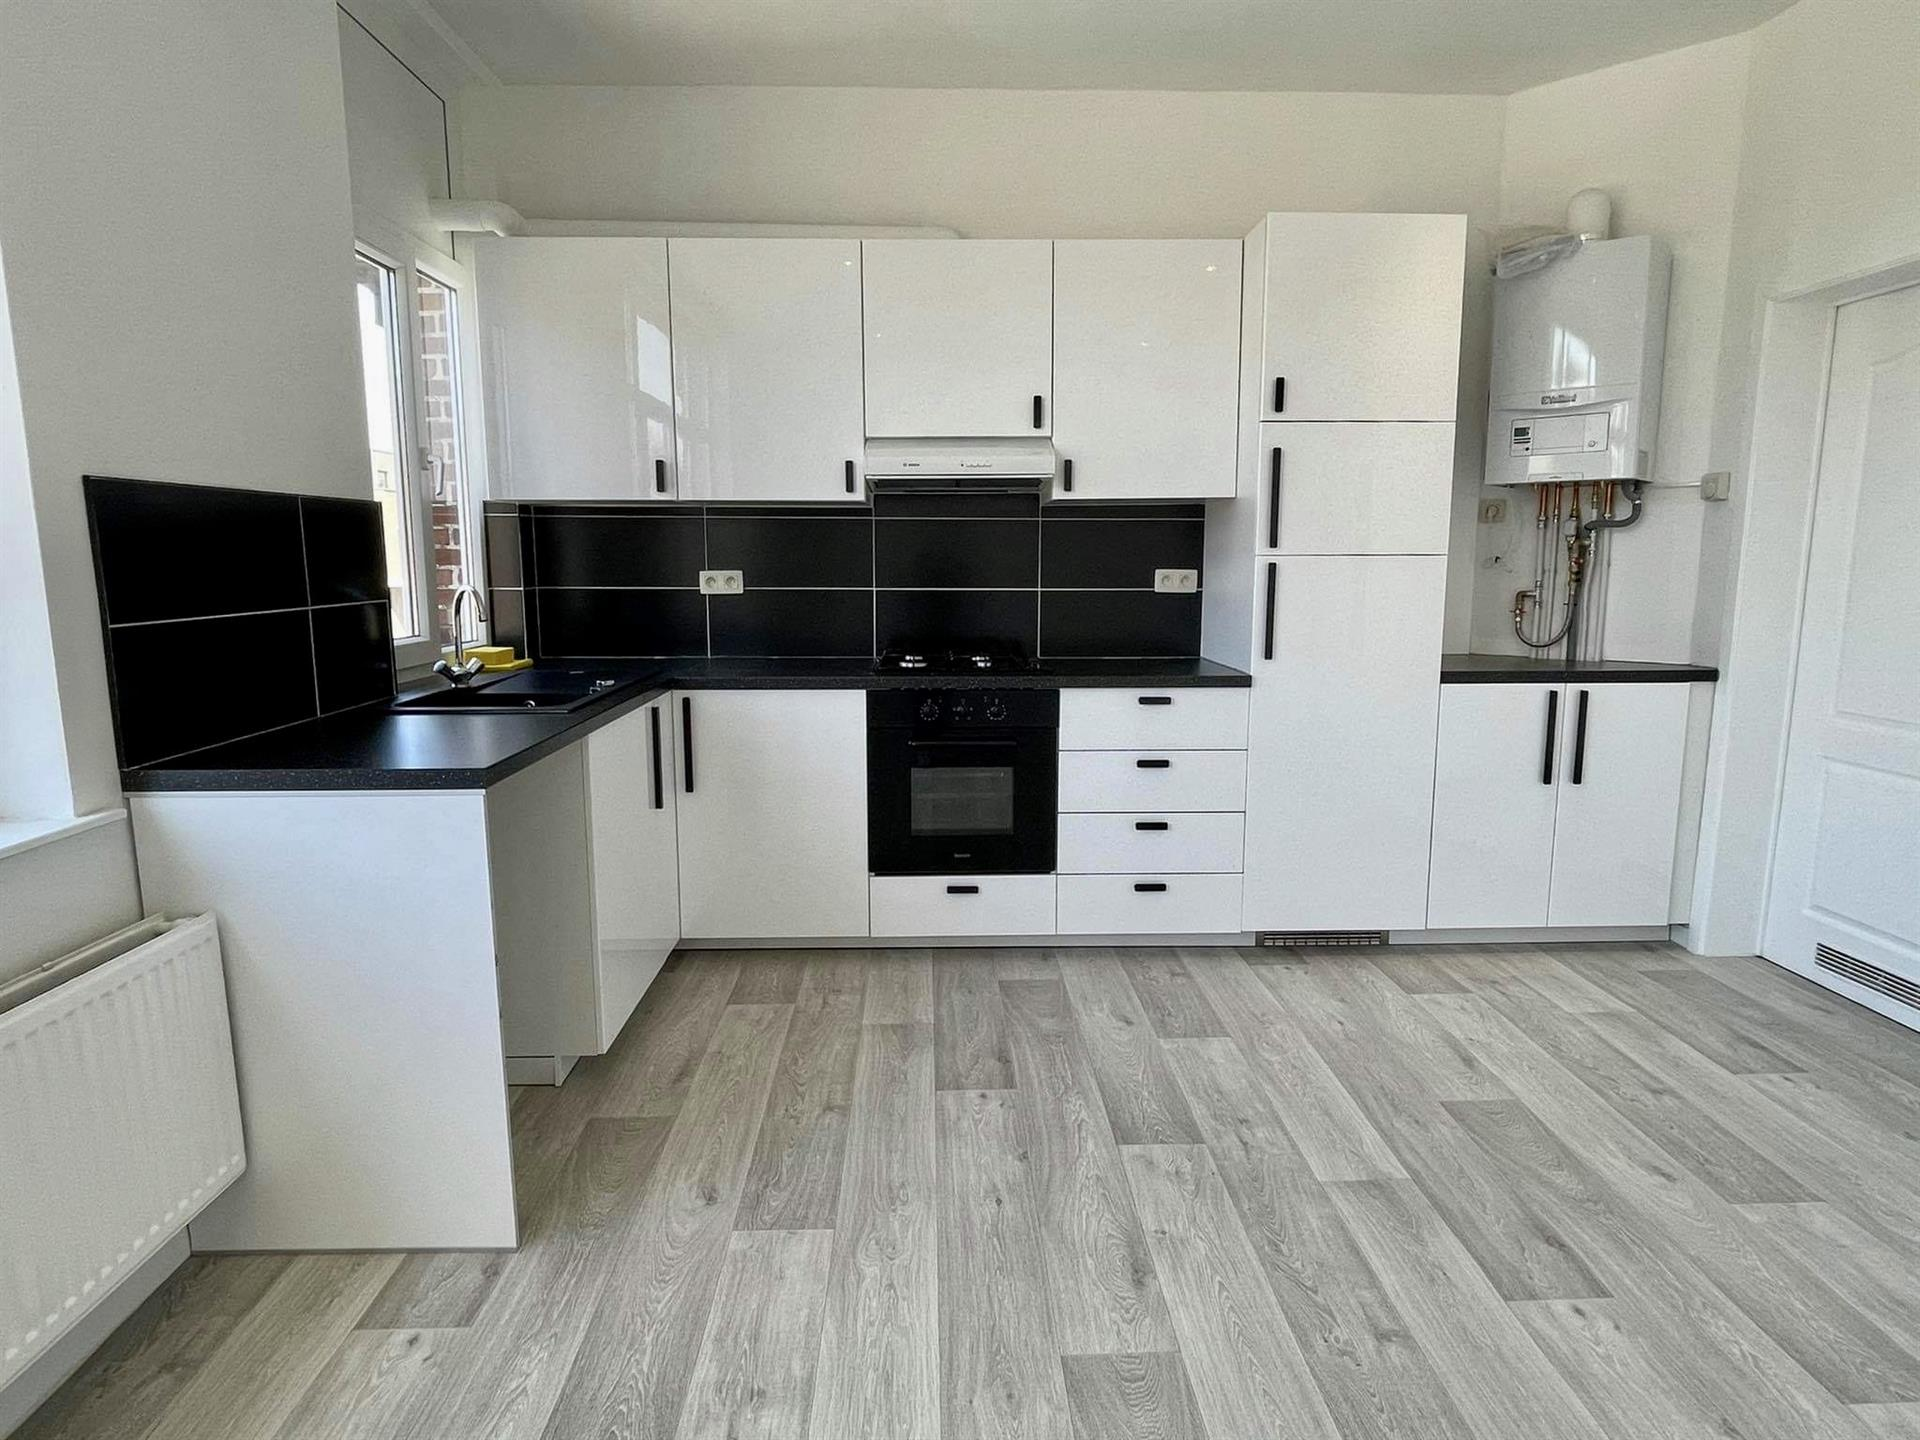 Appartement - Molenbeek-Saint-Jean - #4343762-6